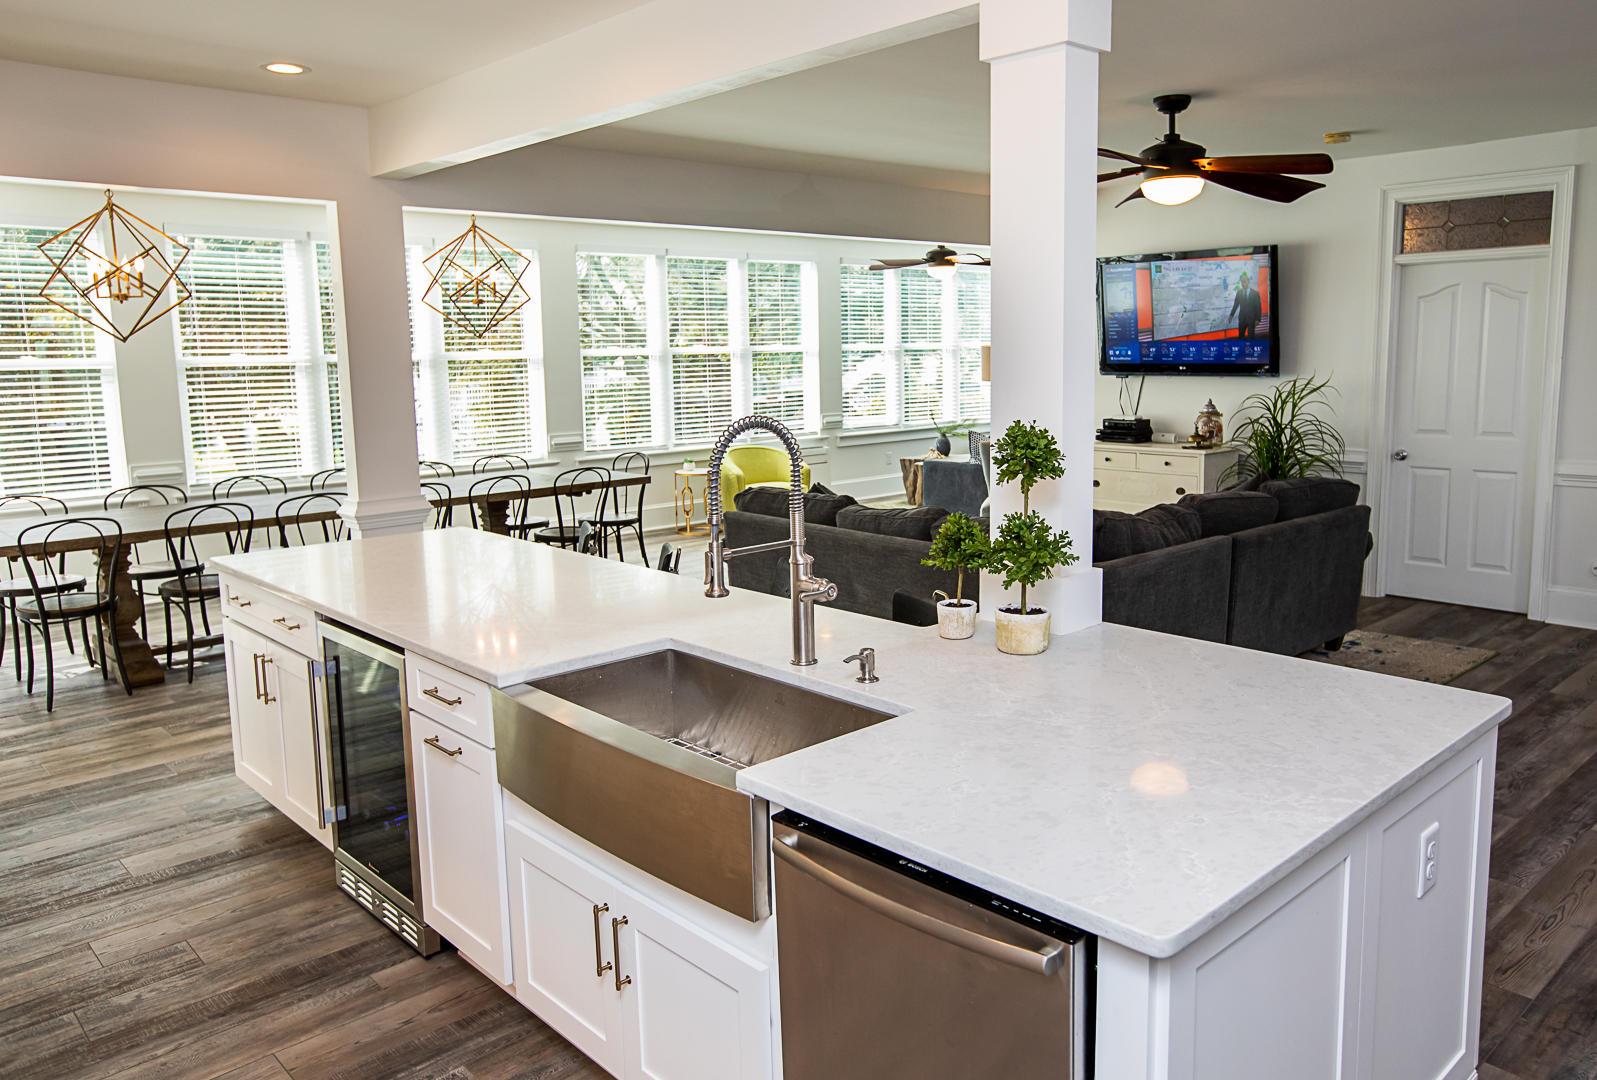 Isle of Palms Homes For Sale - 712 Carolina, Isle of Palms, SC - 11